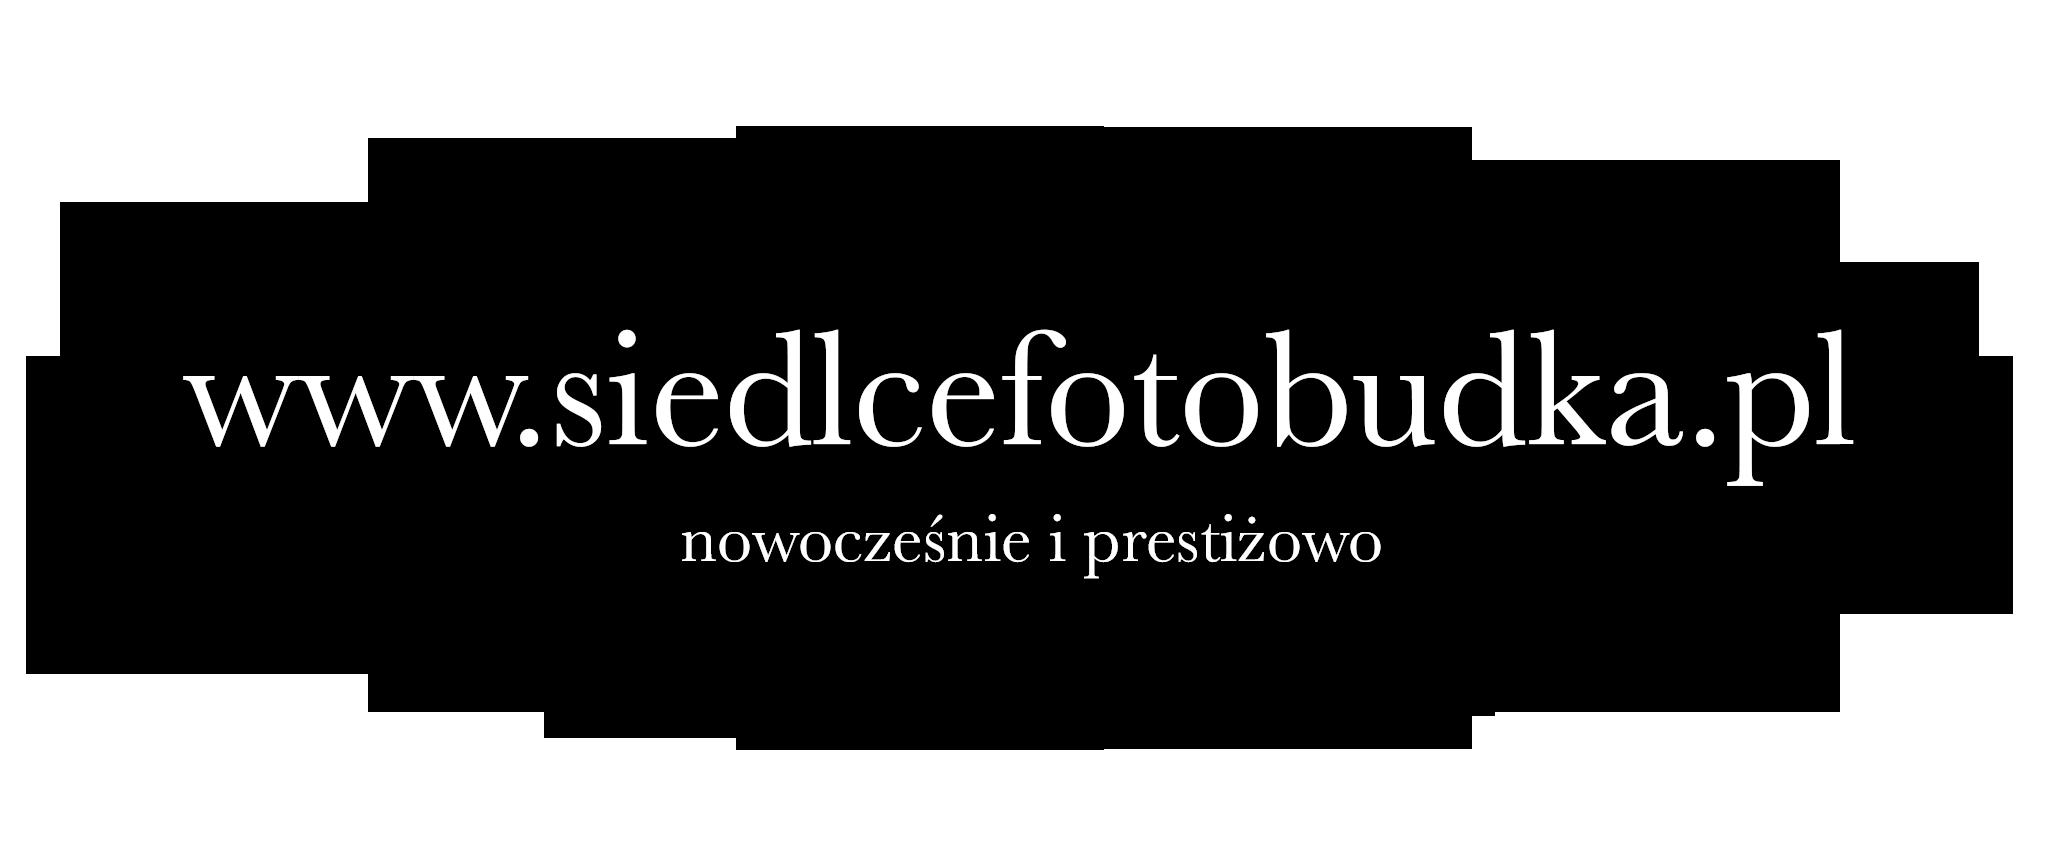 www.siedlcefotobudka.pl